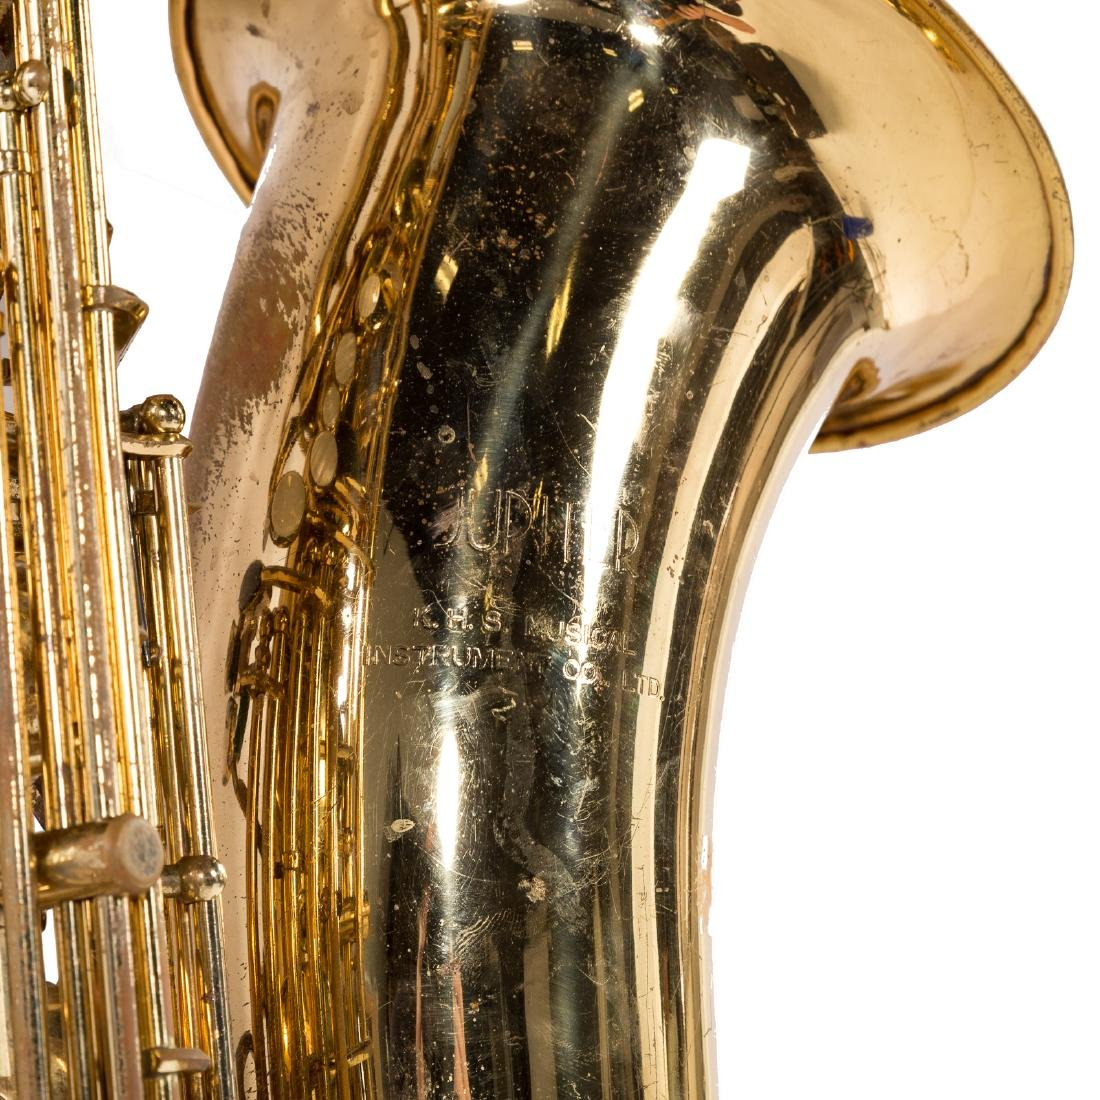 K.H.S. Jupiter alto saxophone - 4